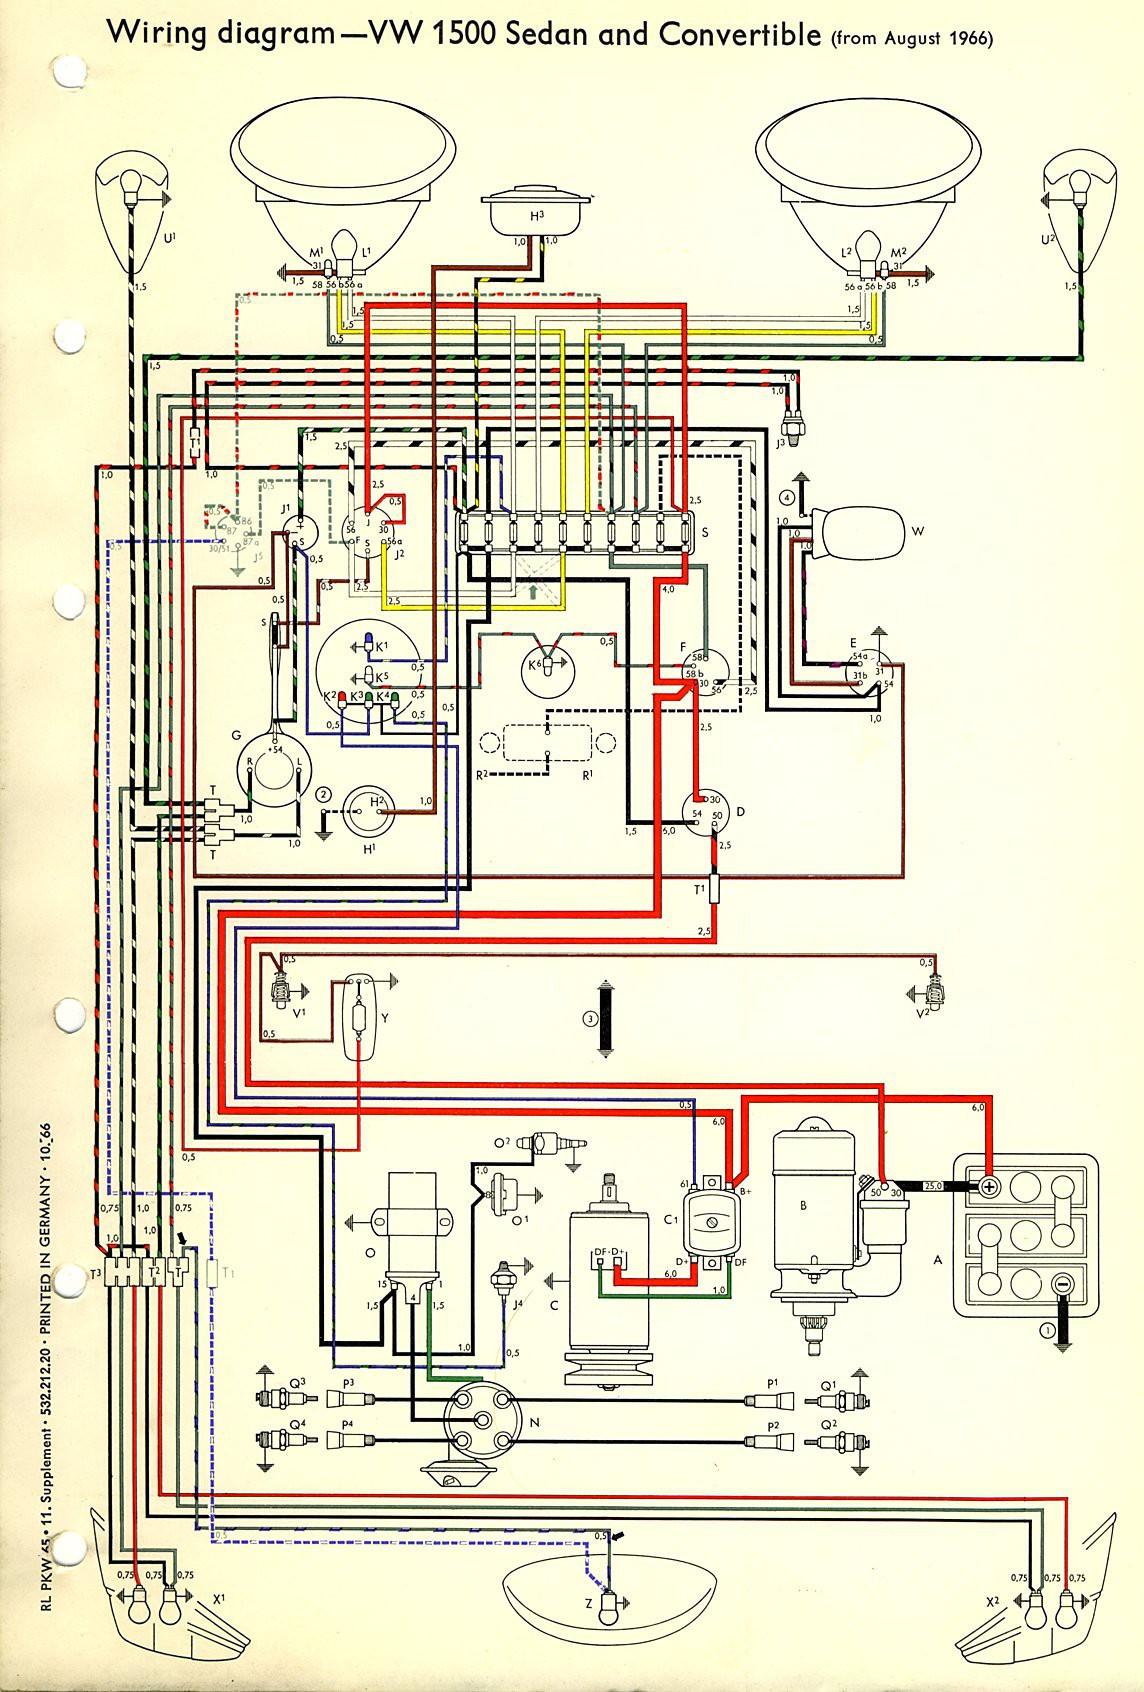 Beetle Generator Wiring Diagram Book Of Wiring Diagram Replace - Wiring Diagram Replace Generator With Alternator